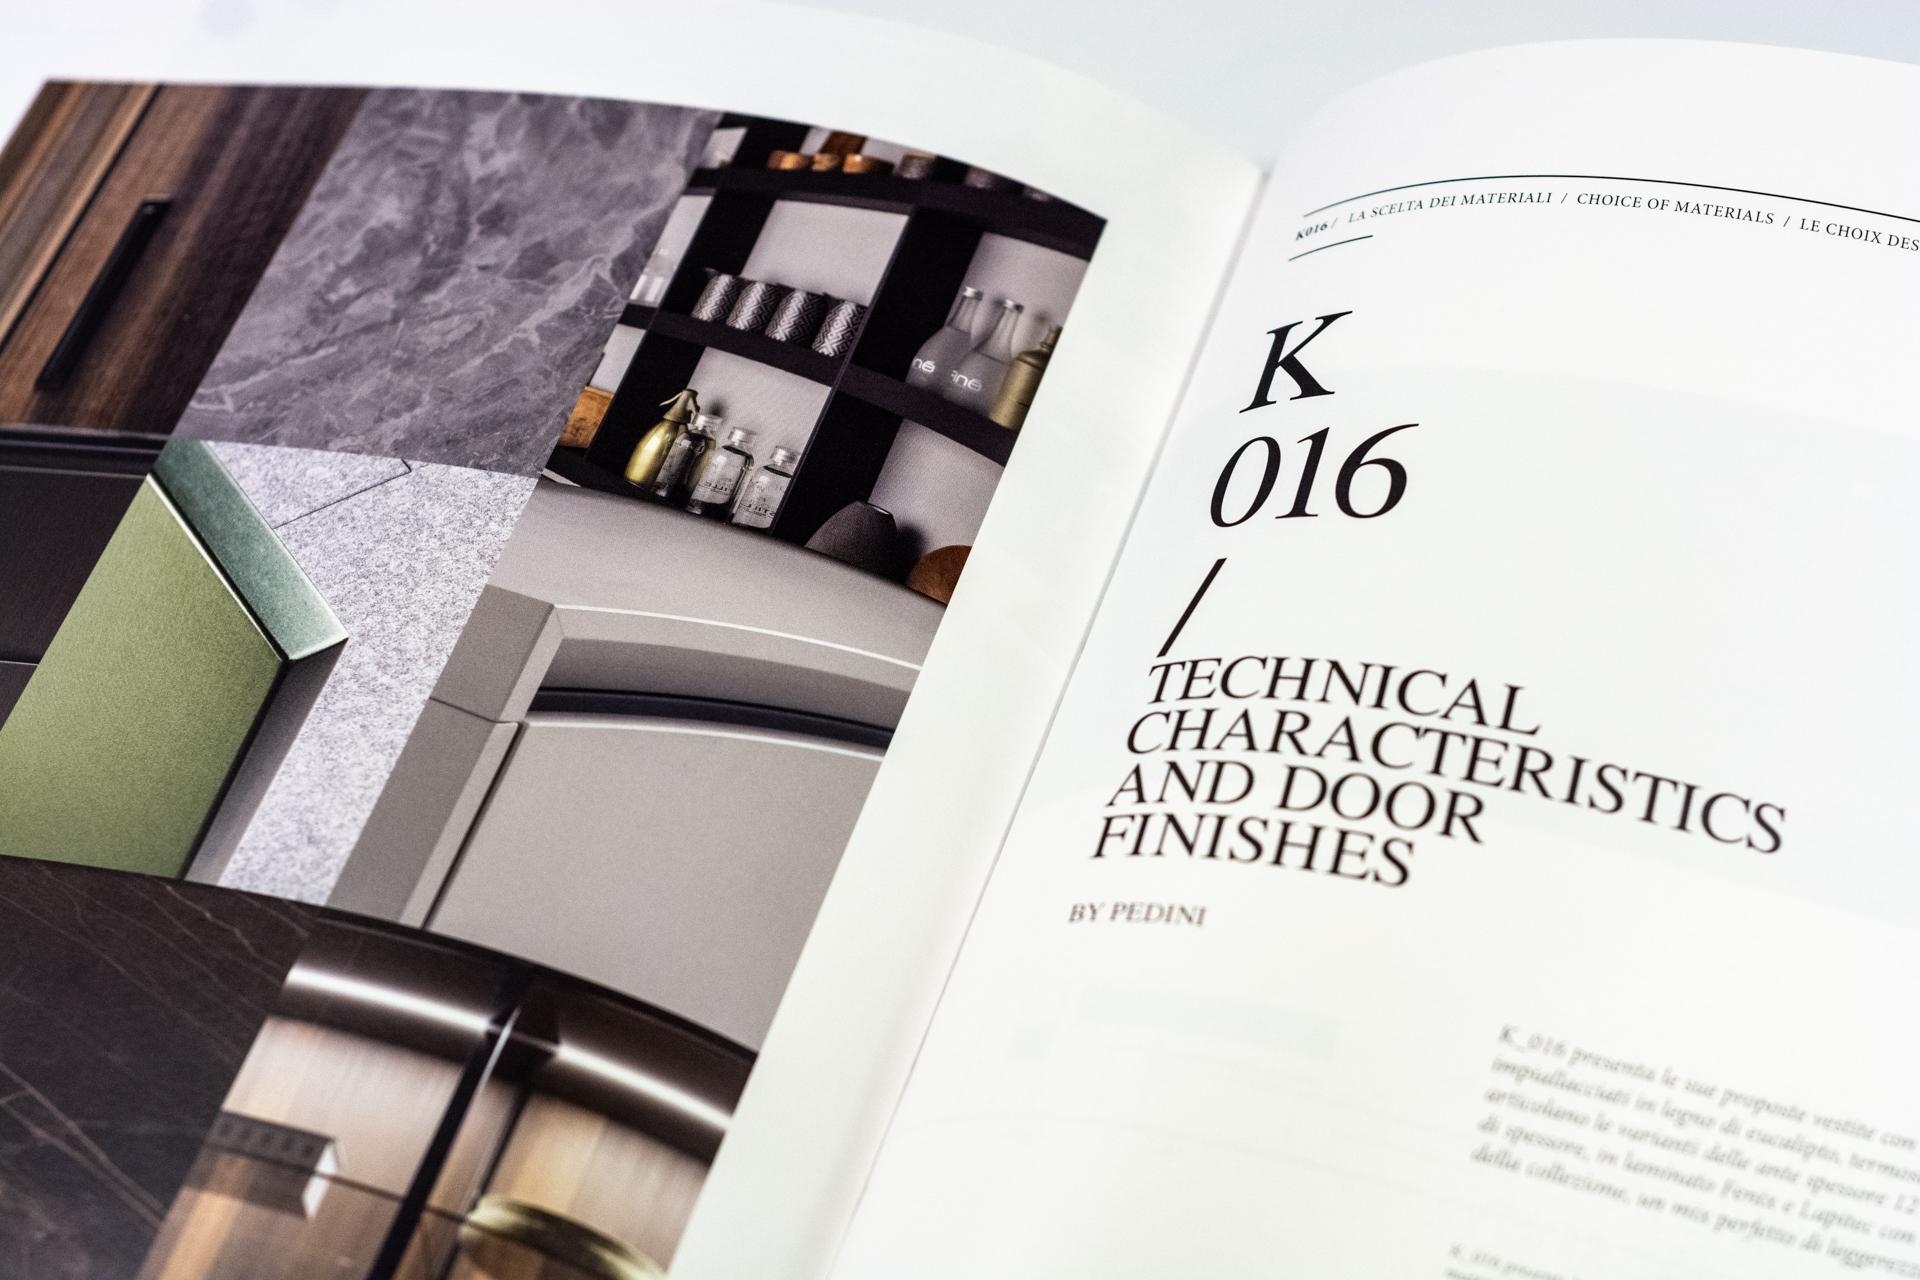 pedini-k016-catalogo-cucine-intercopertina